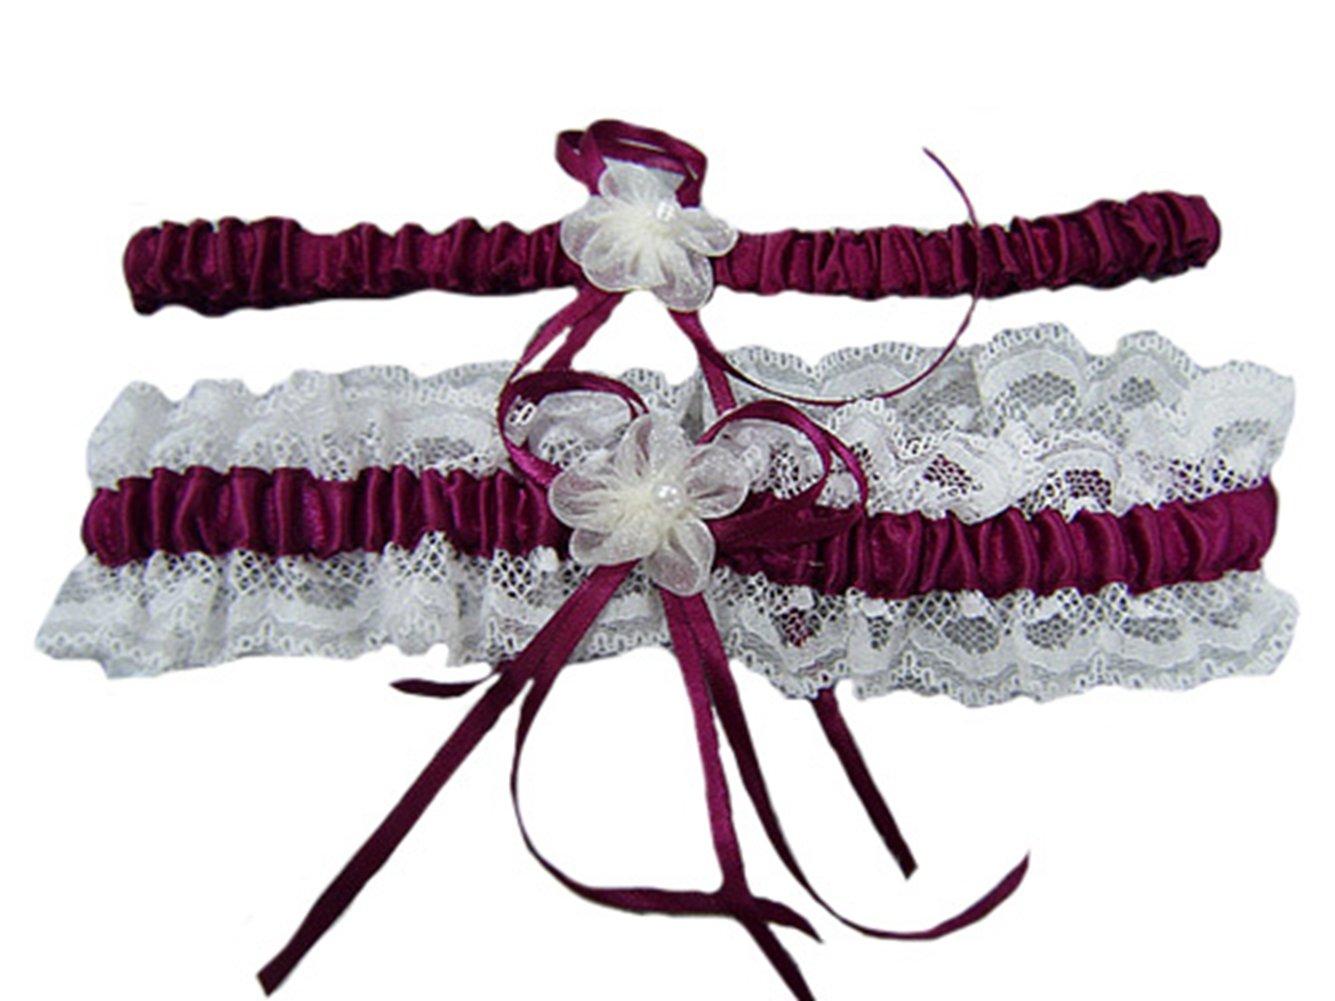 5 Color One Set Hot Women Stain Peal Lace Floral Wedding Garter Bridals Belt 2 Pieces Pink ZeHui